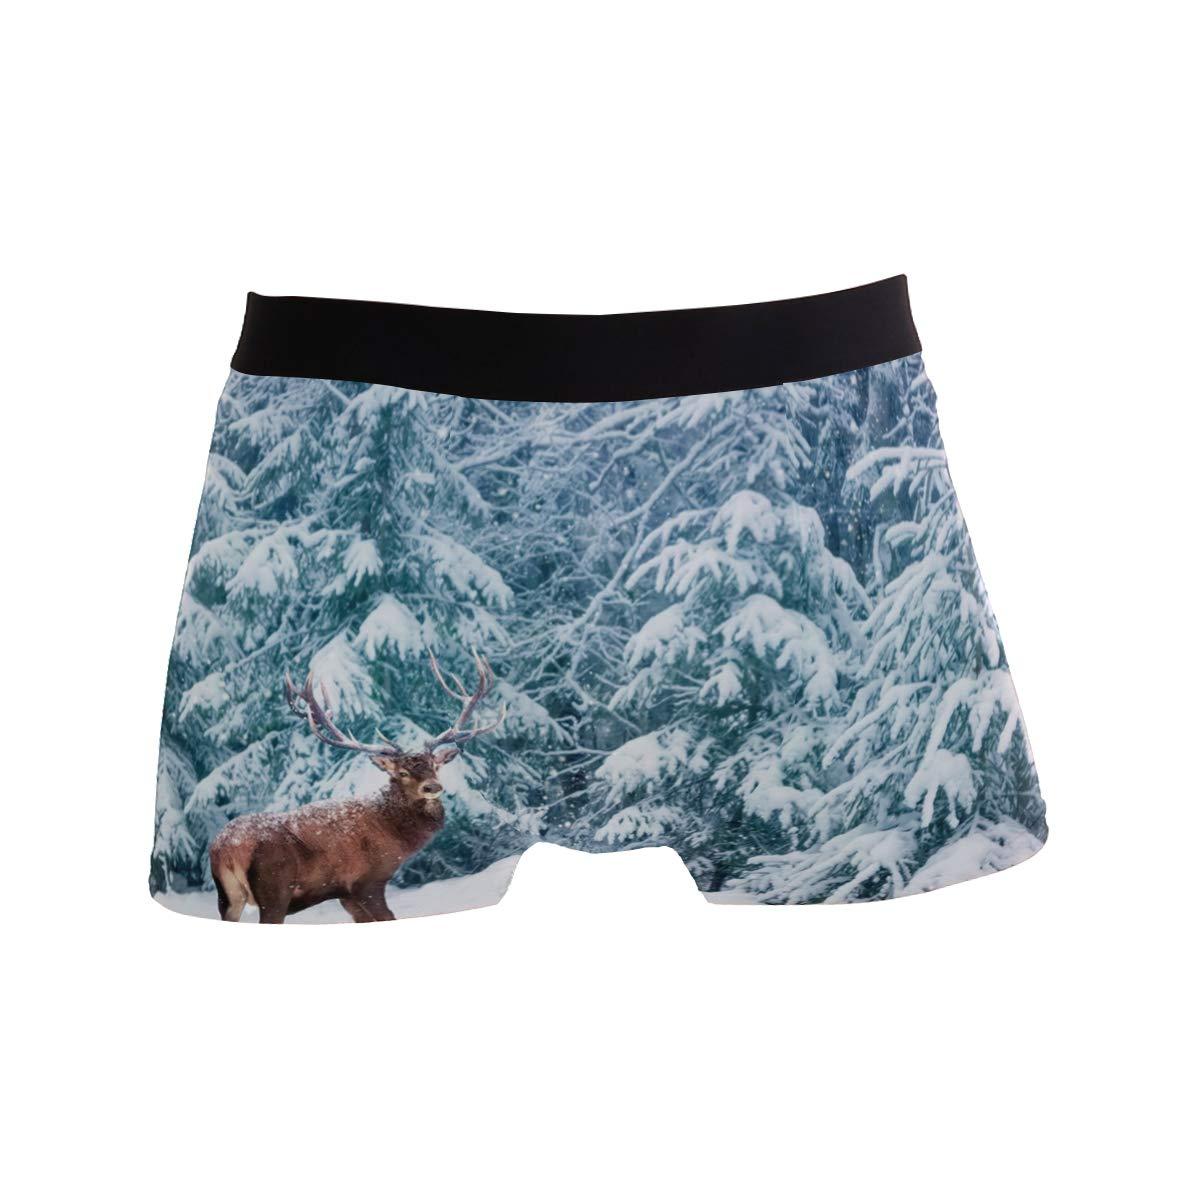 CATSDER Beautiful Deer Winter Snowy Forest Boxer Briefs Mens Underwear Pack Seamless Comfort Soft